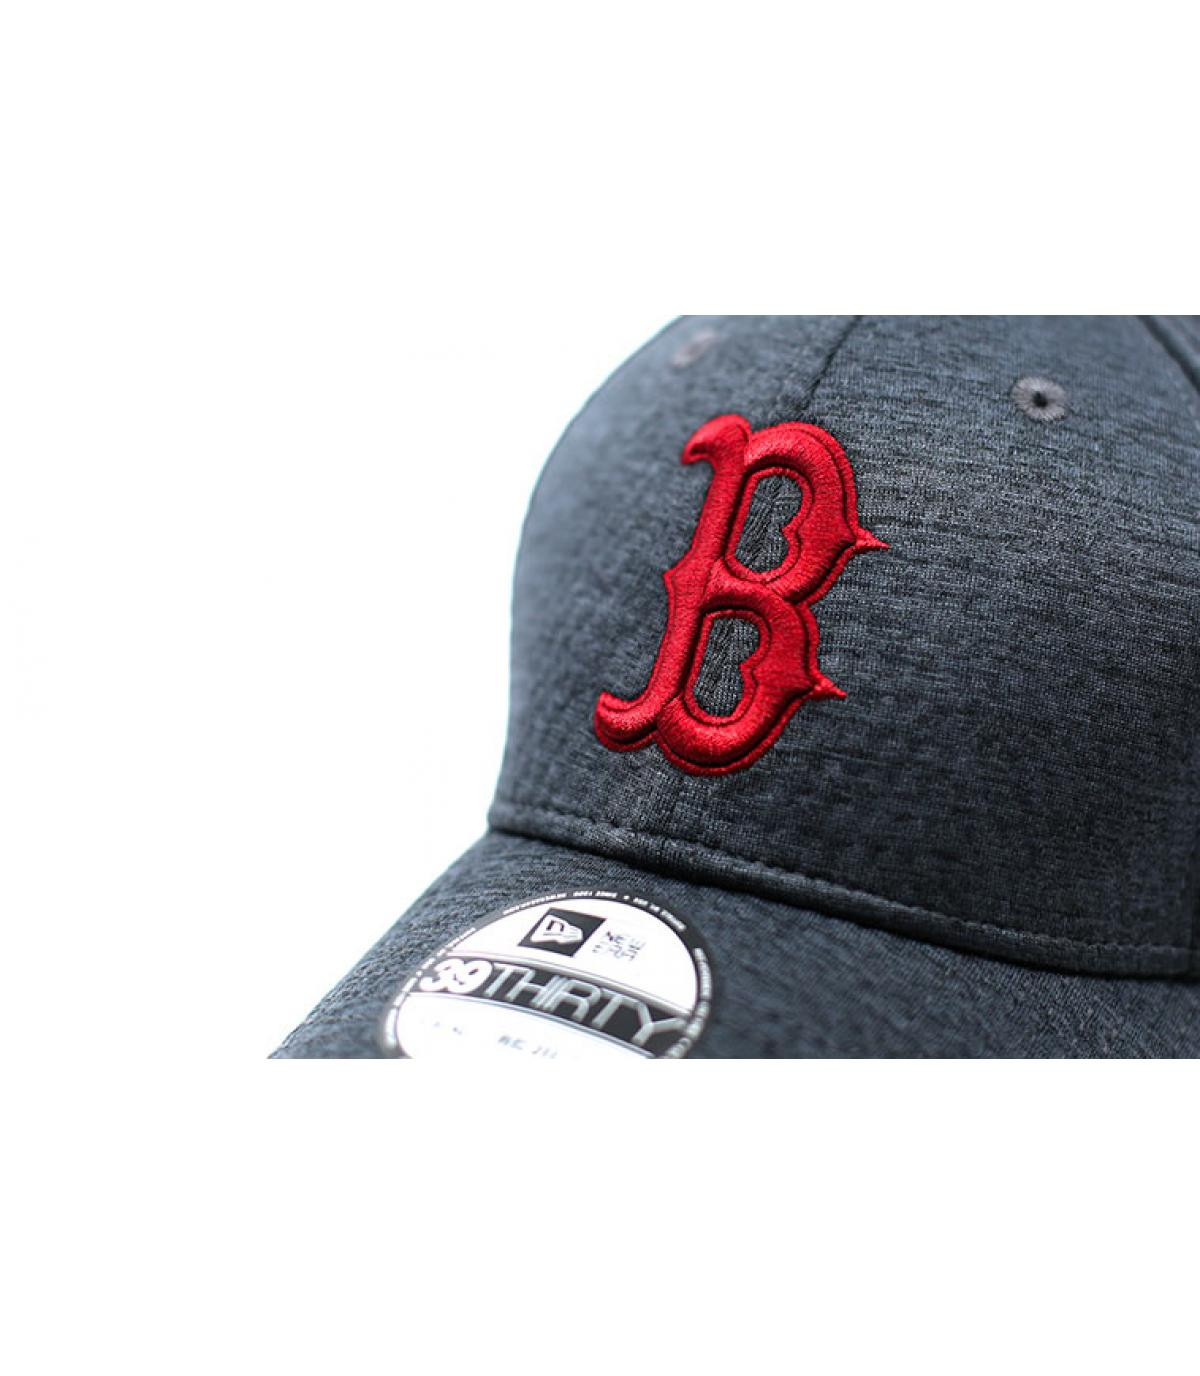 Dettagli Boston Dryswitch Jersey 39Thirty black cardinal - image 3